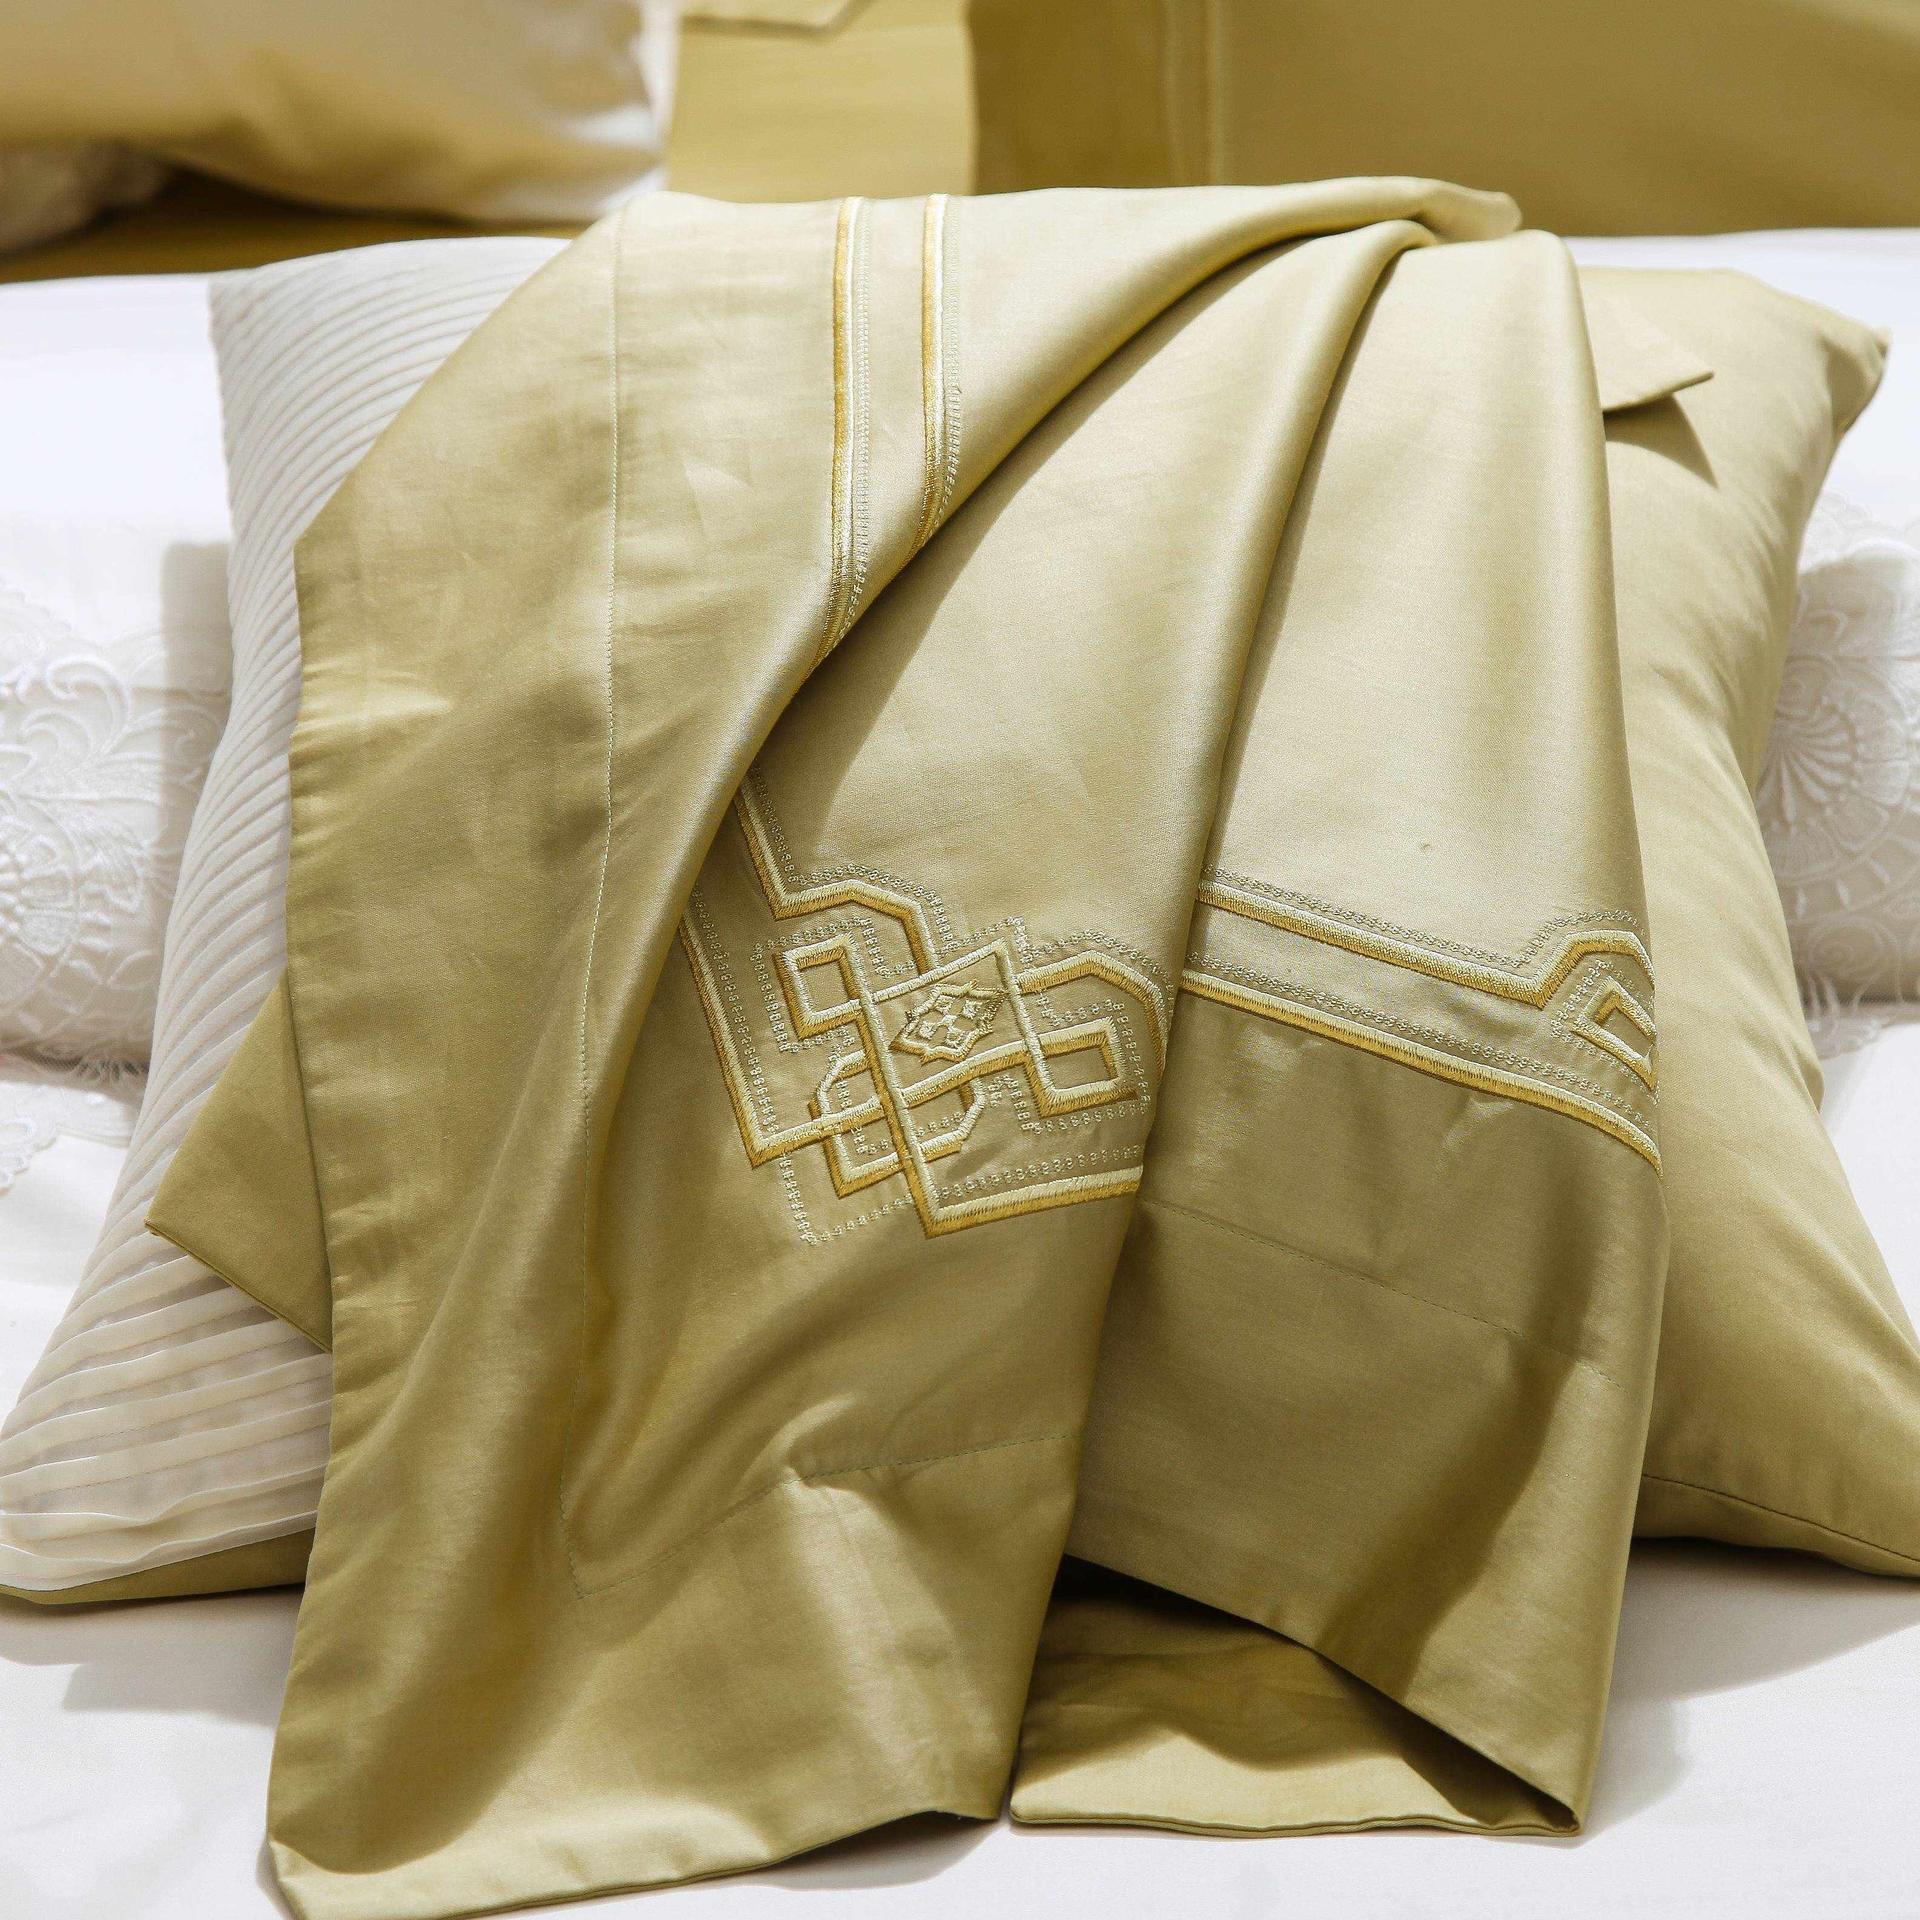 Magnolia Embroidery Cotton Bedding 6889